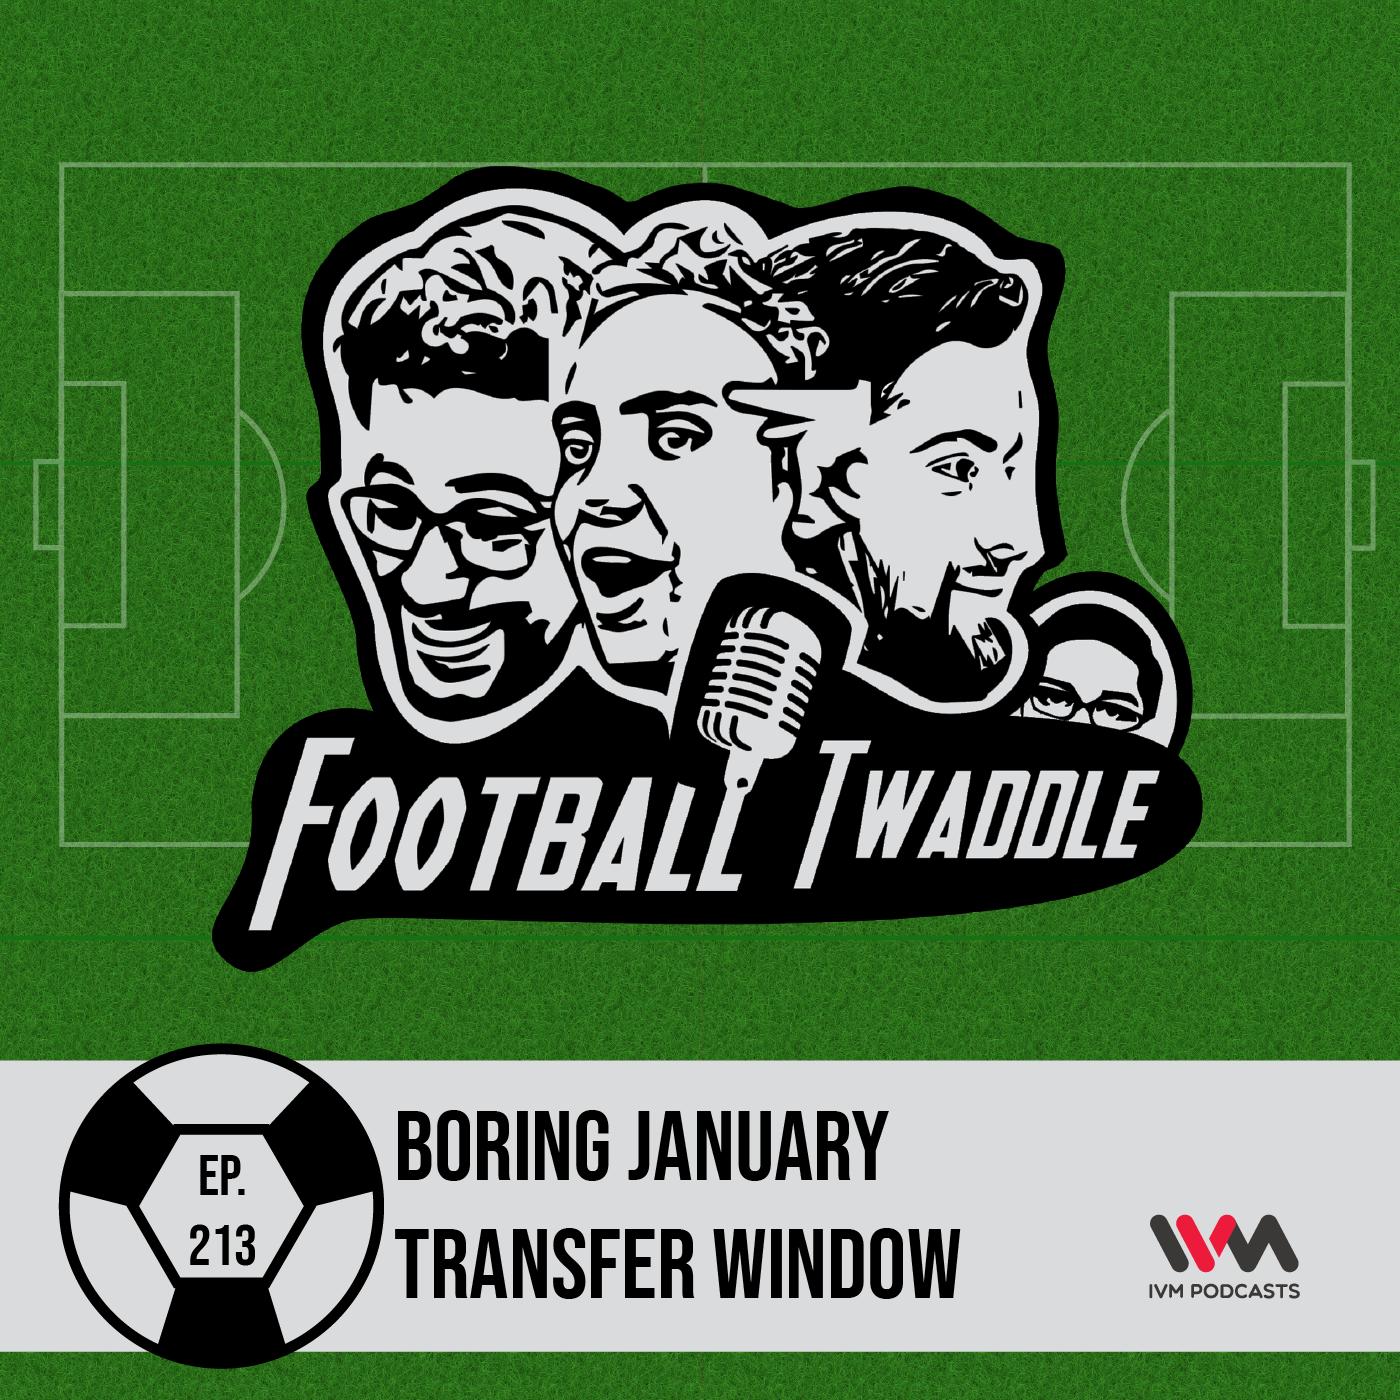 Boring January Transfer Window